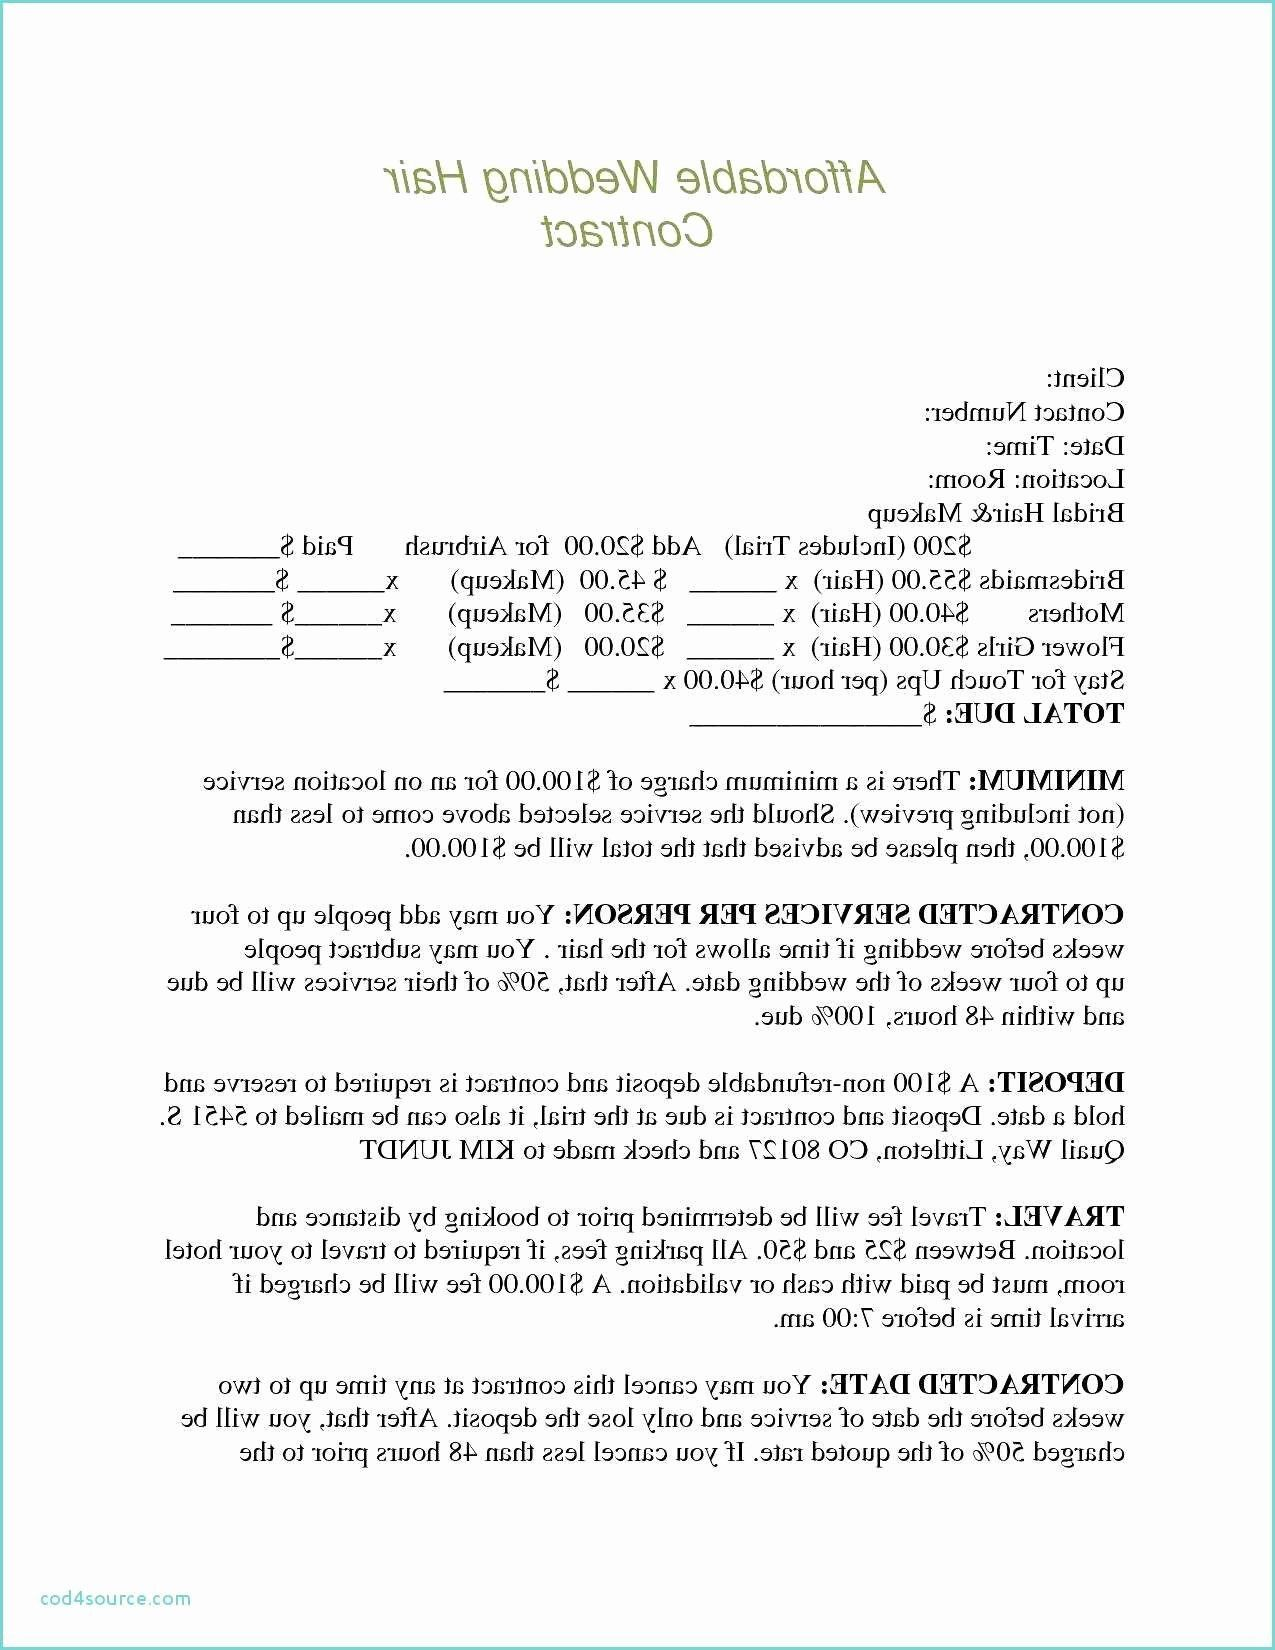 Money Loan Agreement Template Free Inspirational Auto Loan Document Template Money Loan Agreemen Makeup Artist Resume Wedding Reception Schedule Artist Resume